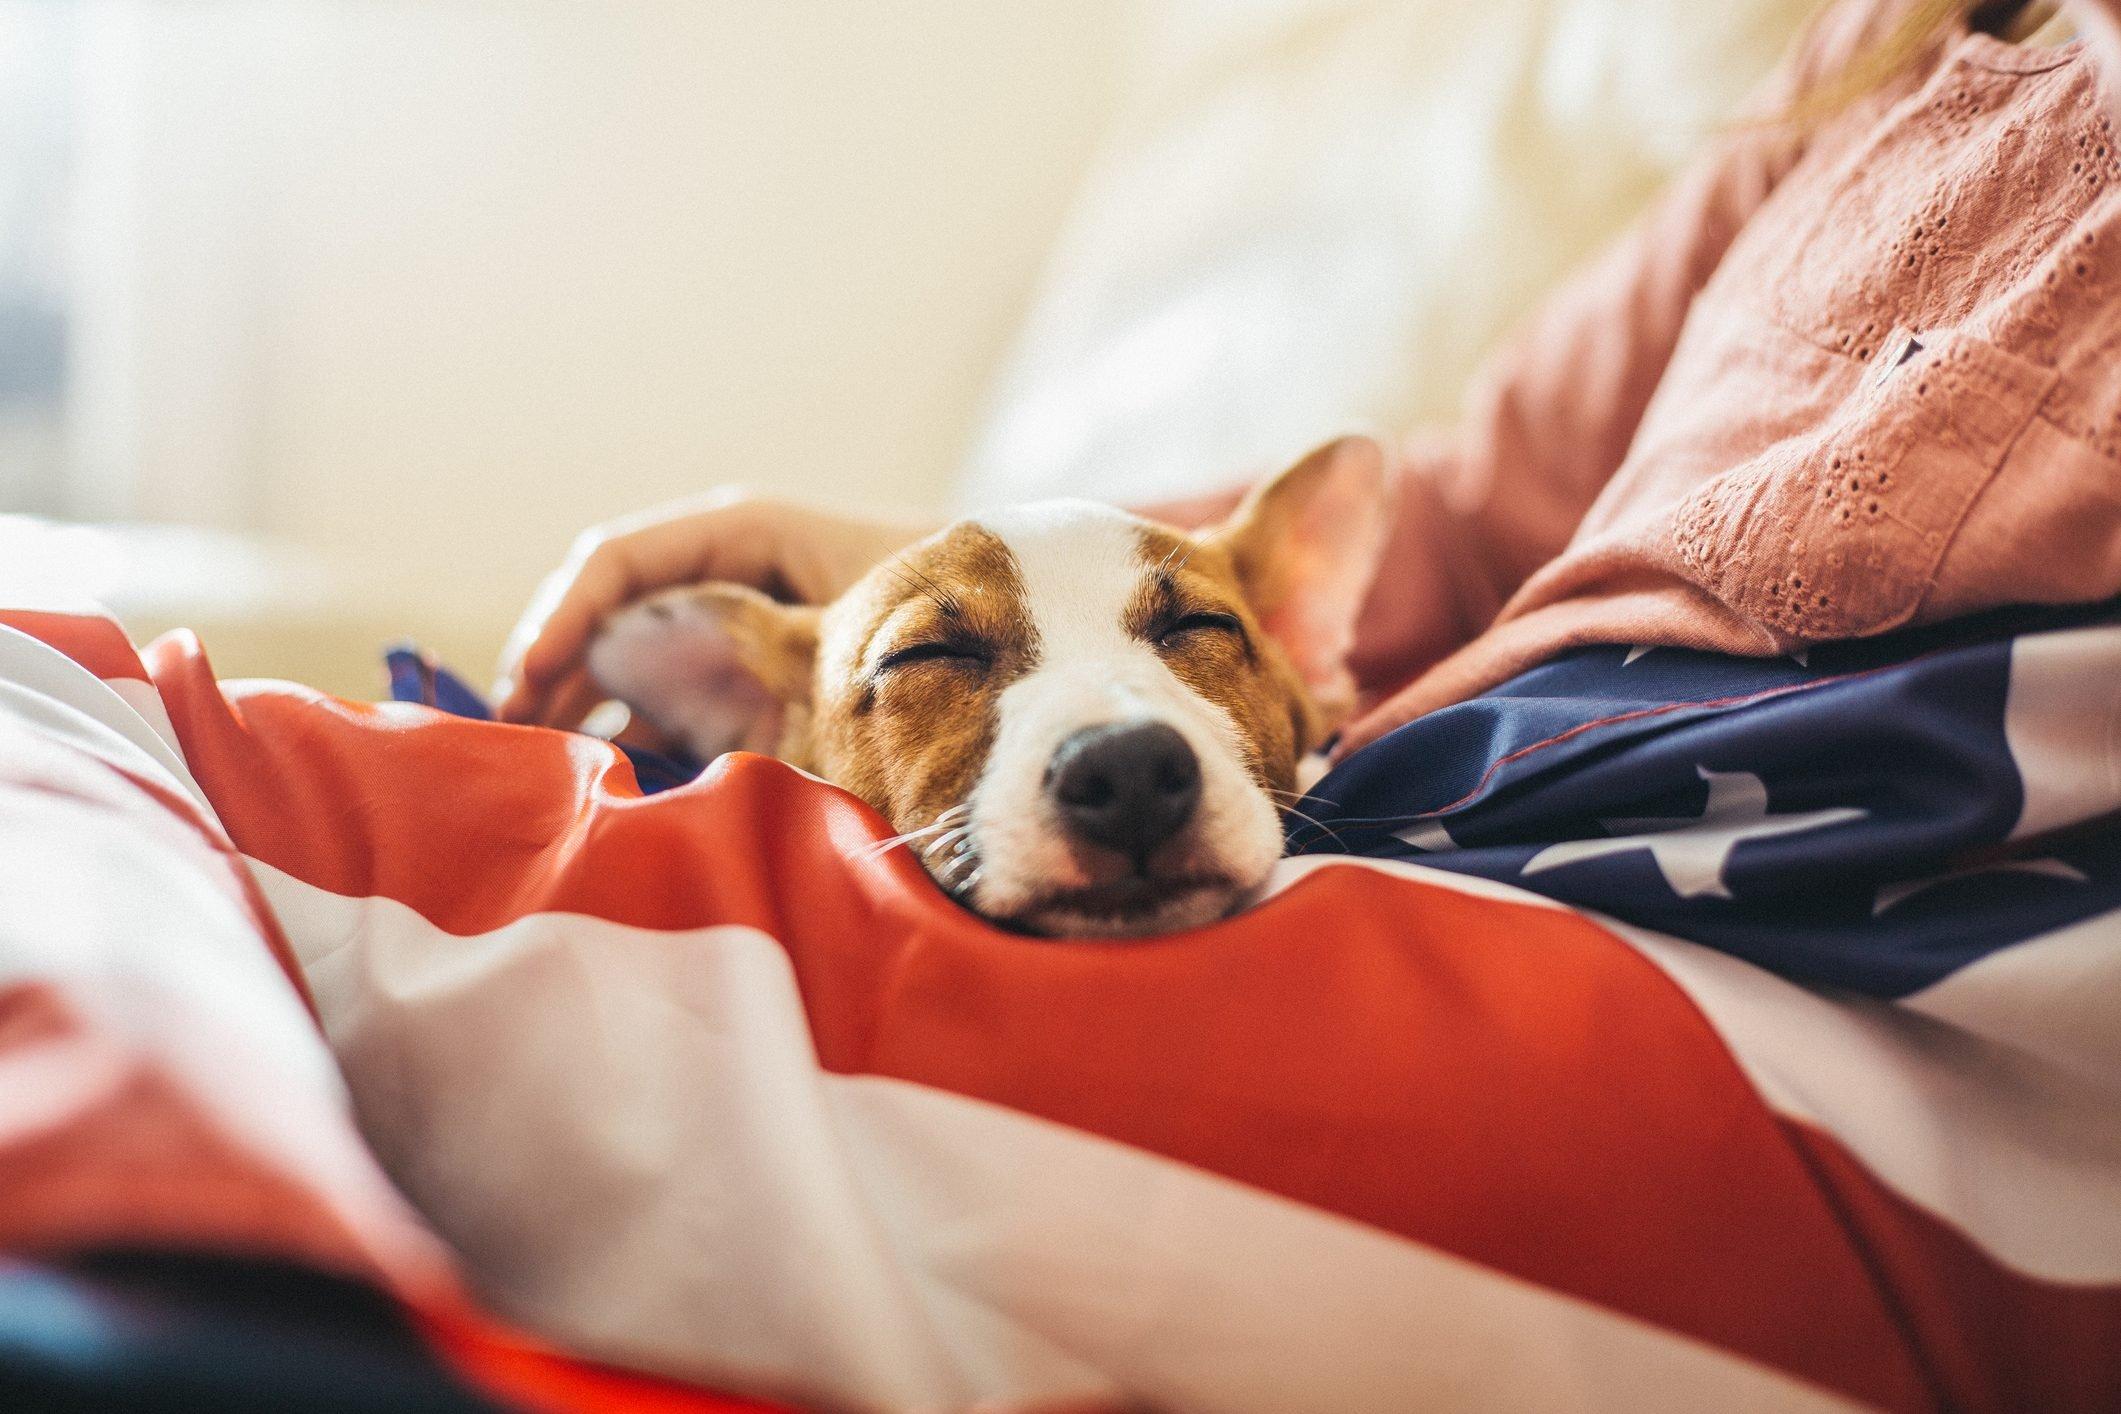 Jack russel puppy sleeping on American flag